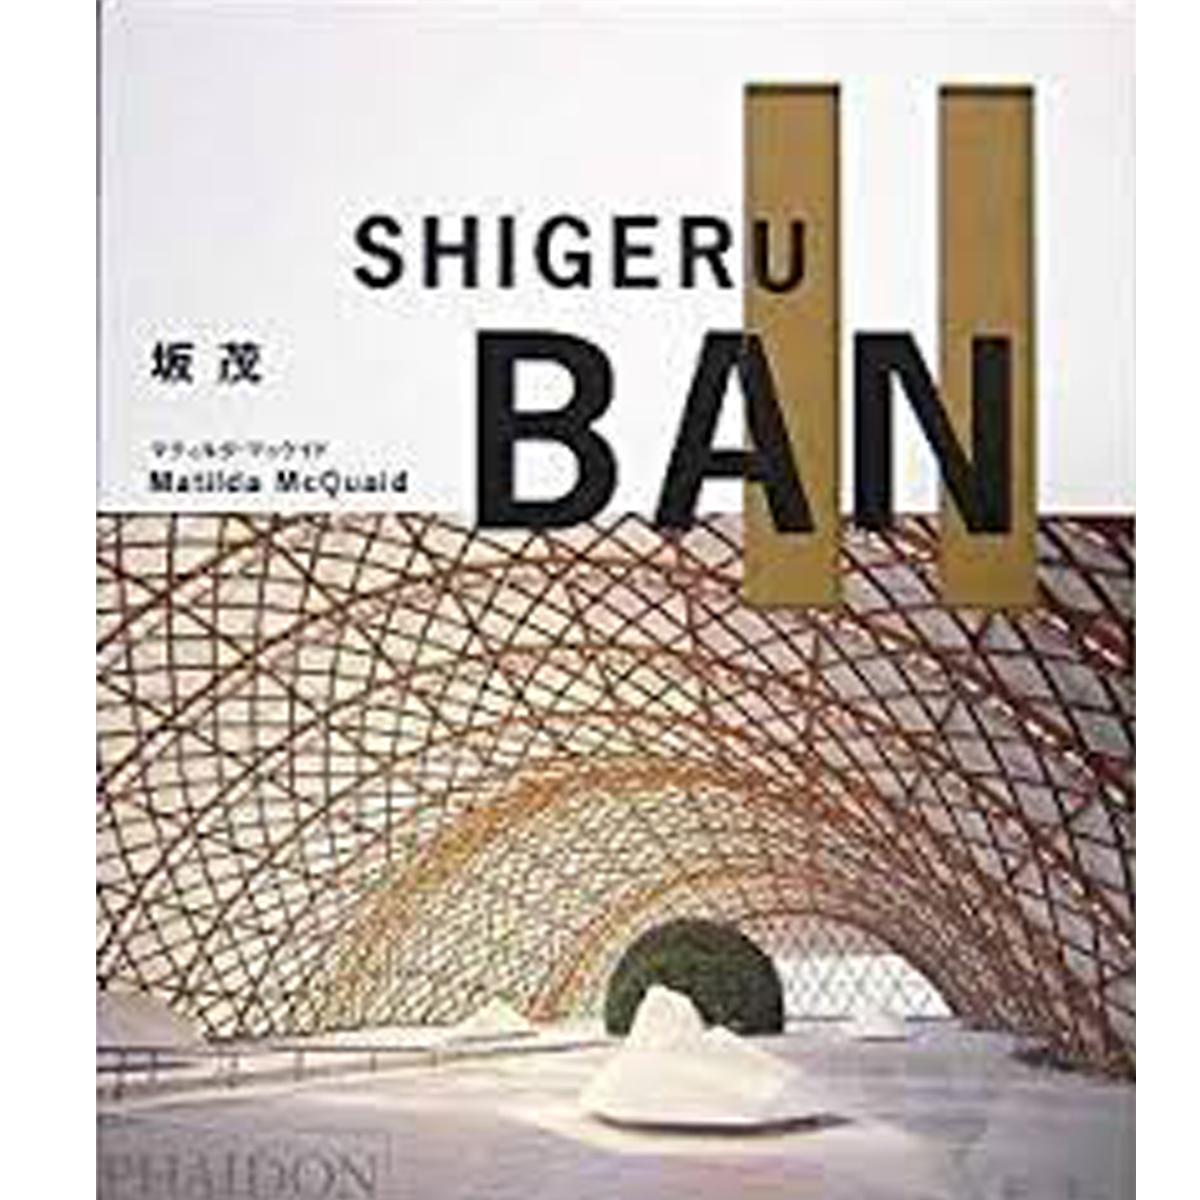 Shigeru Ban